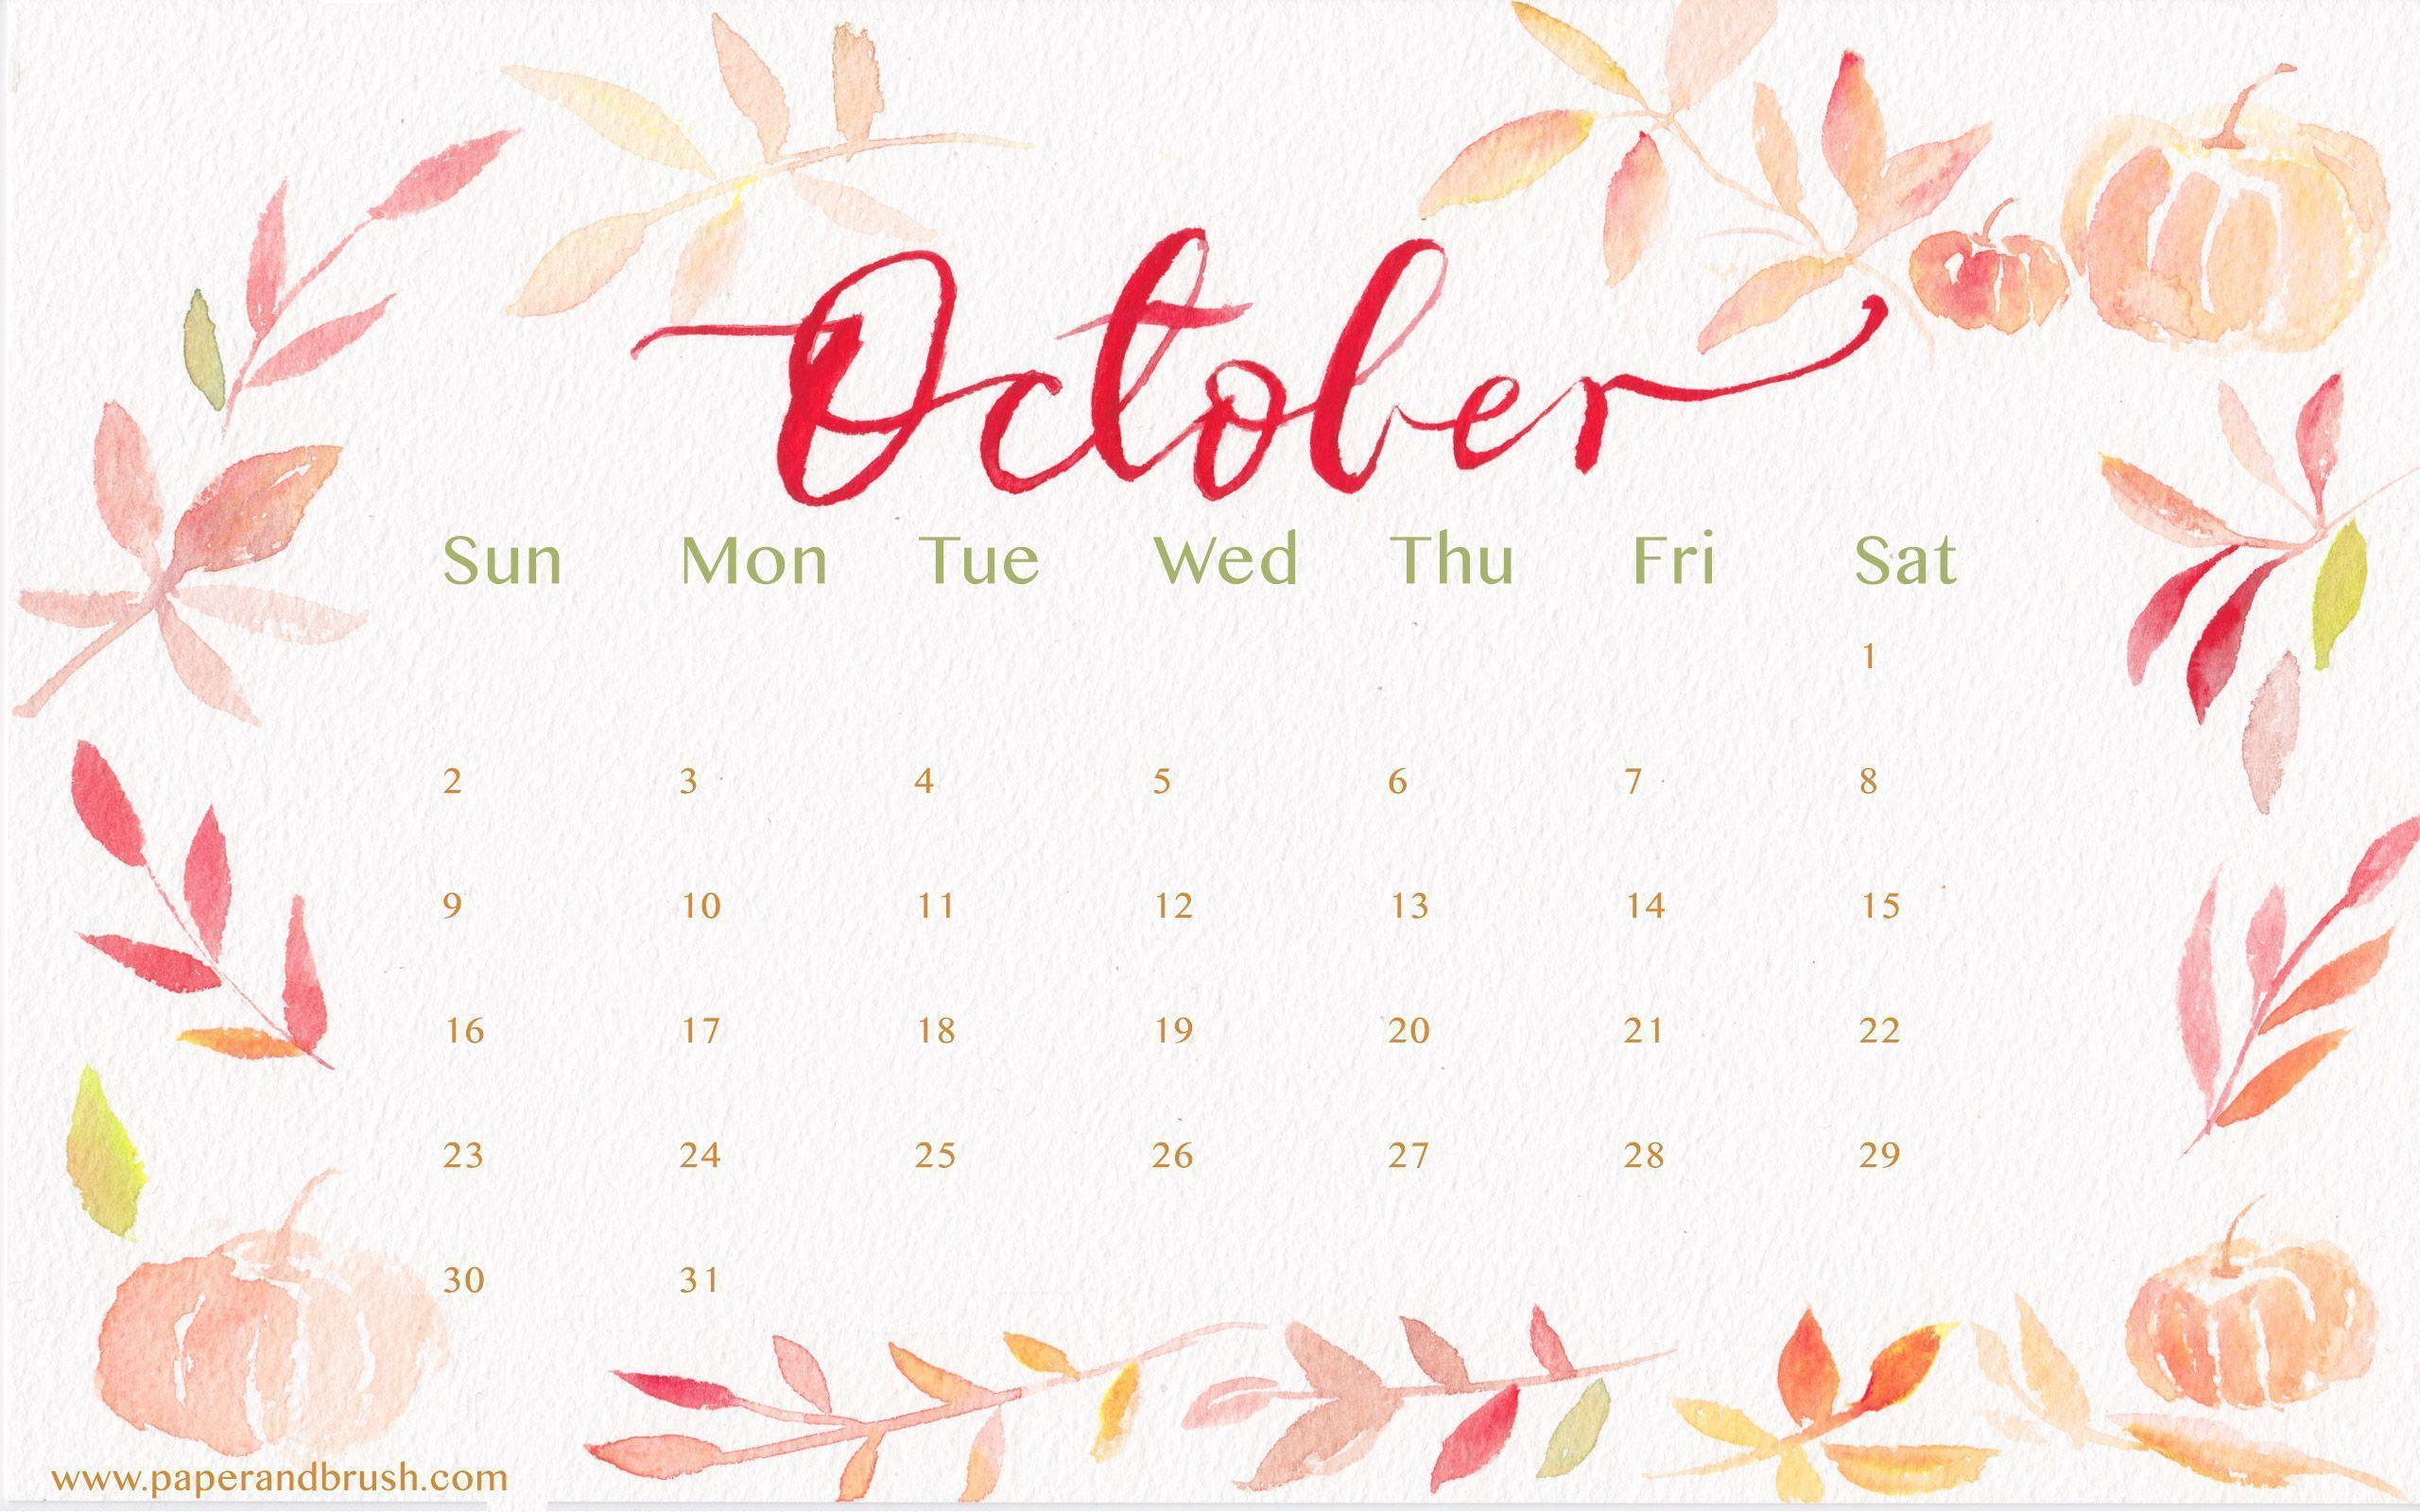 Calendar Wallpaper October : Desktop wallpapers calendar october wallpaper cave